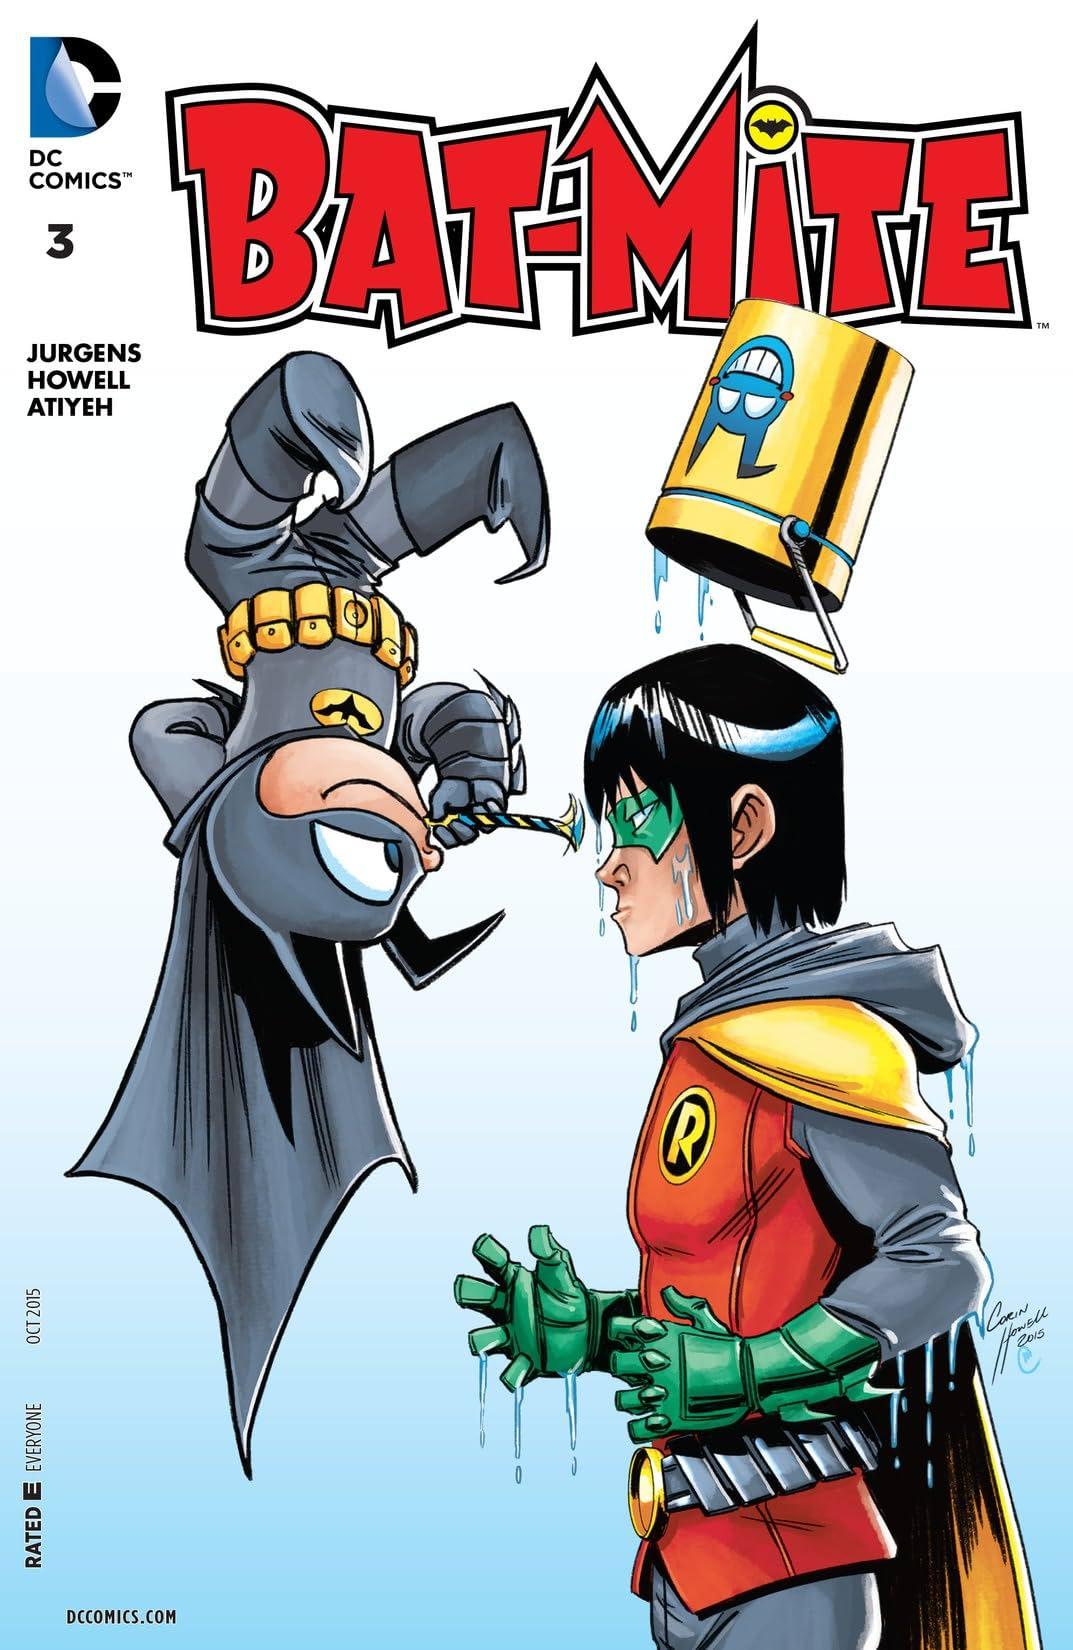 Bat-Mite (2015) #3